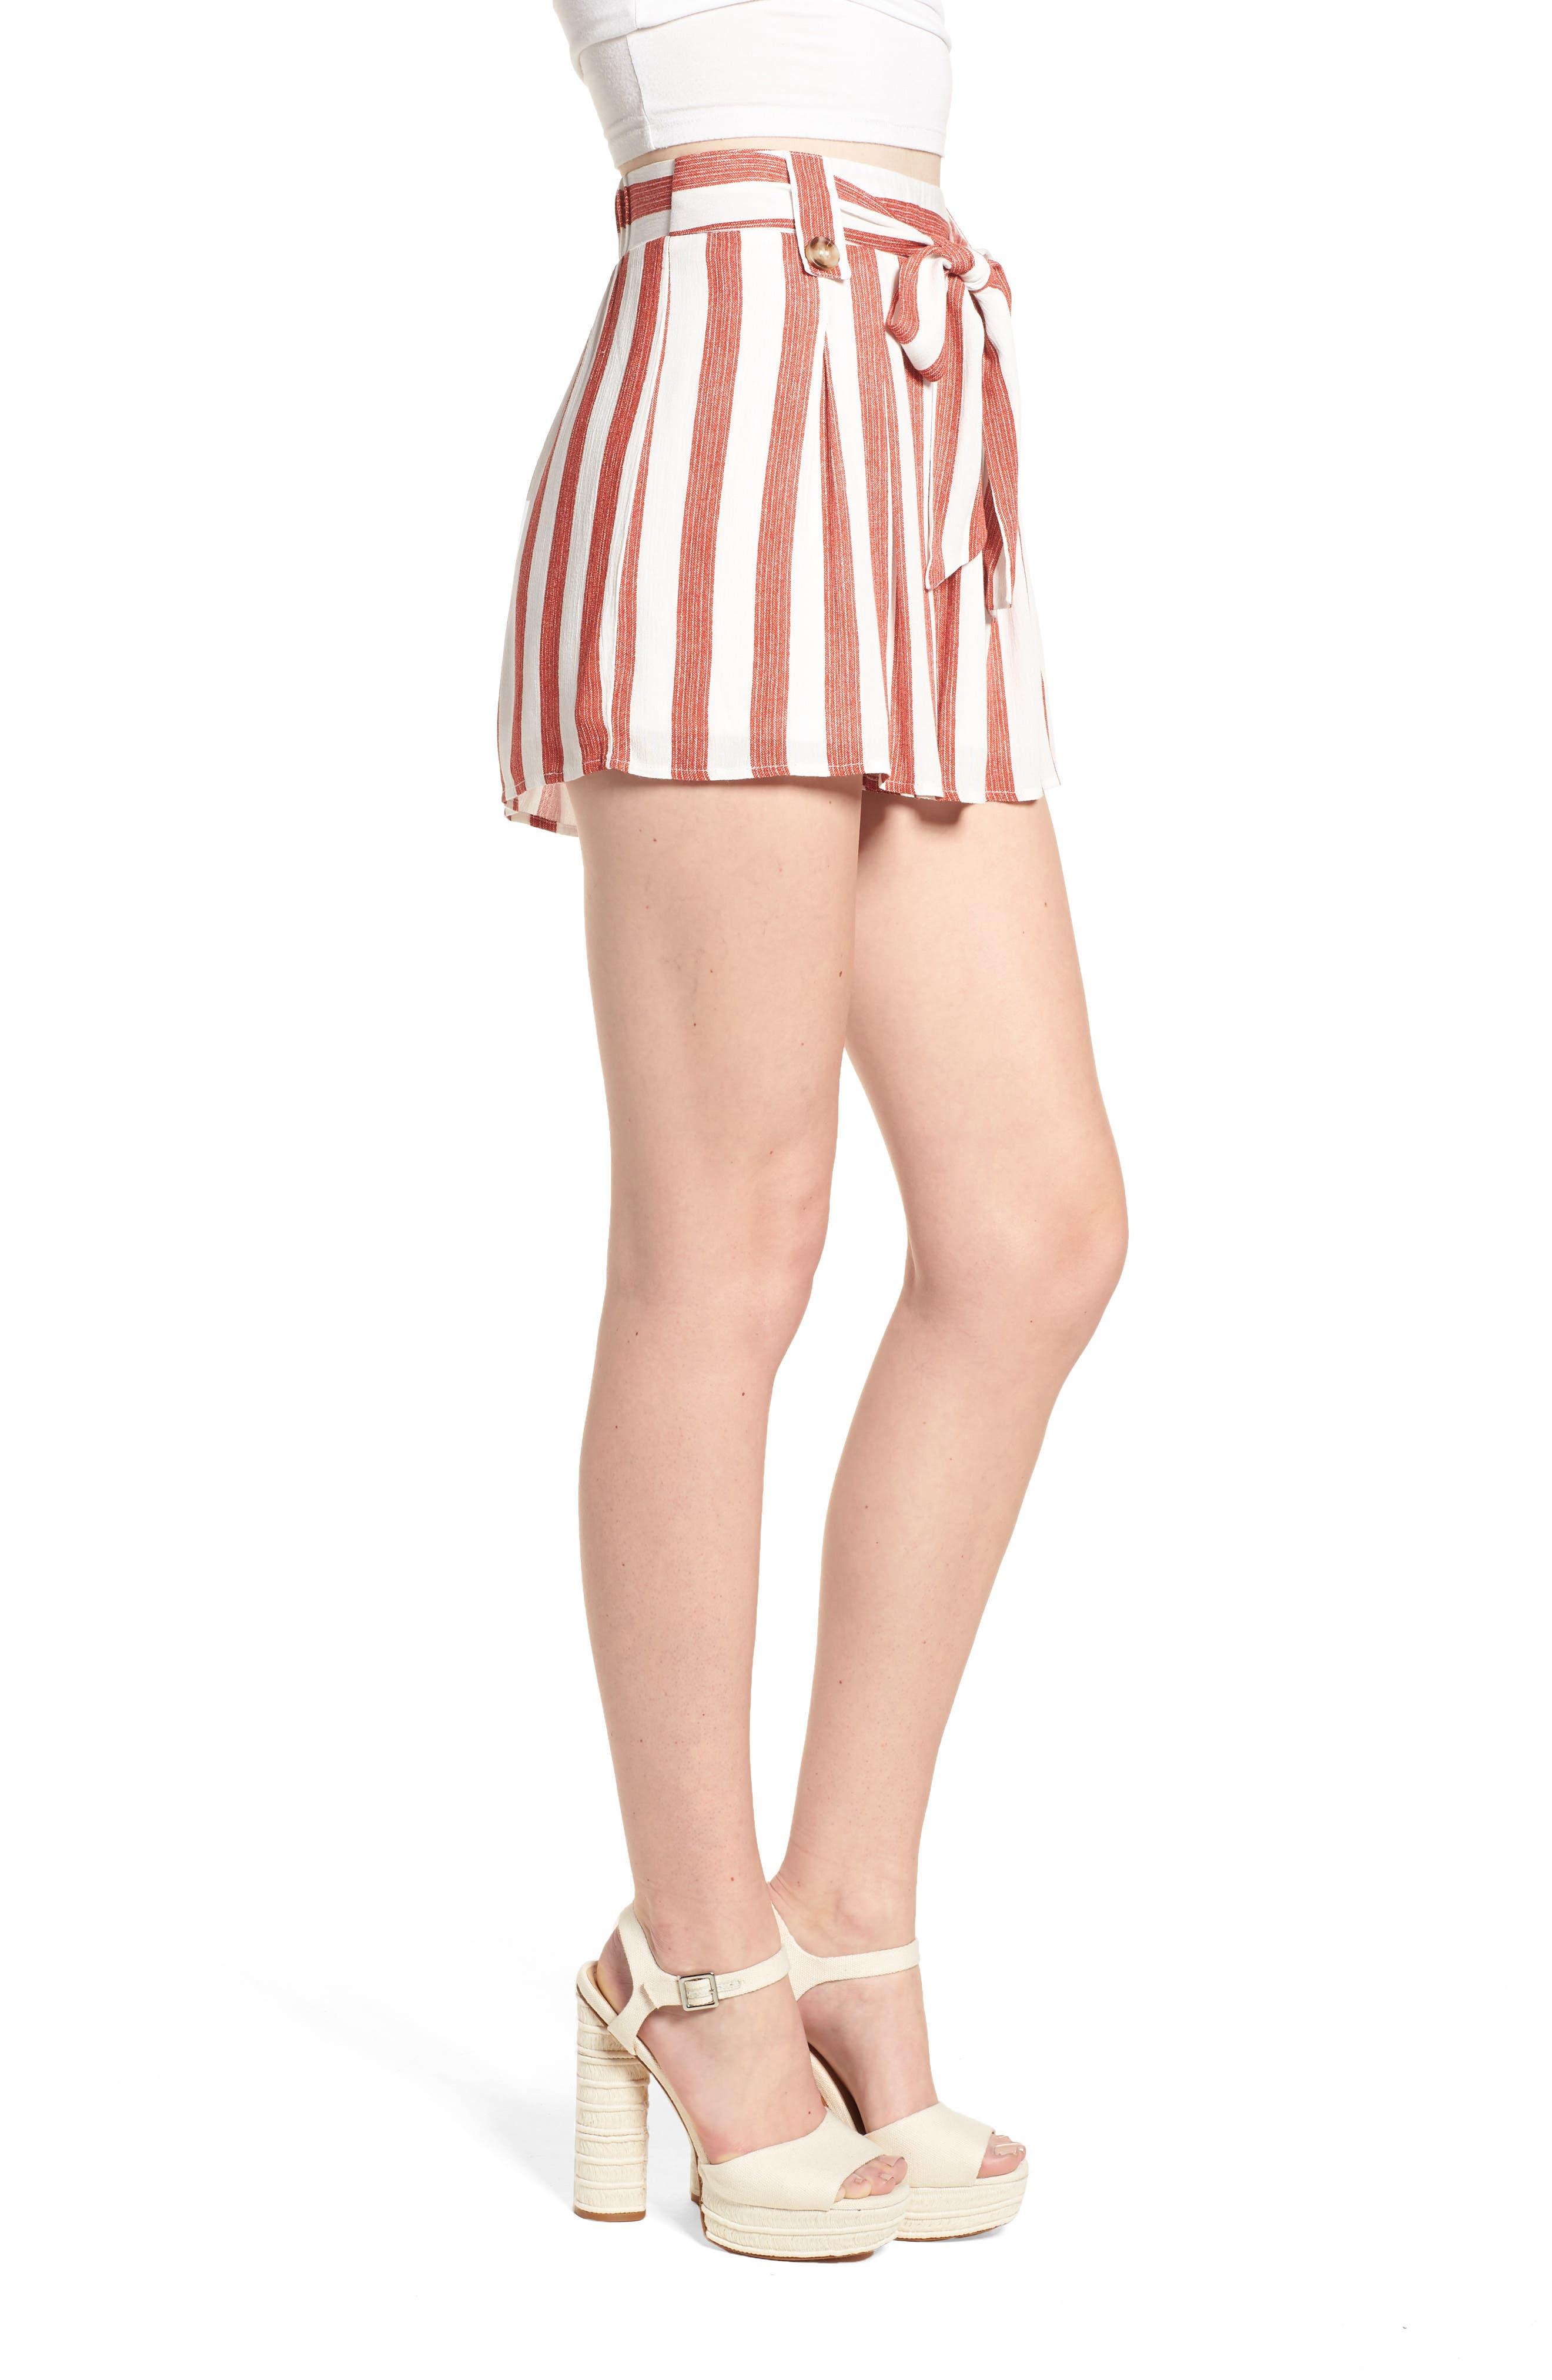 Stripe Shorts,                             Alternate thumbnail 4, color,                             Red/ Ivory